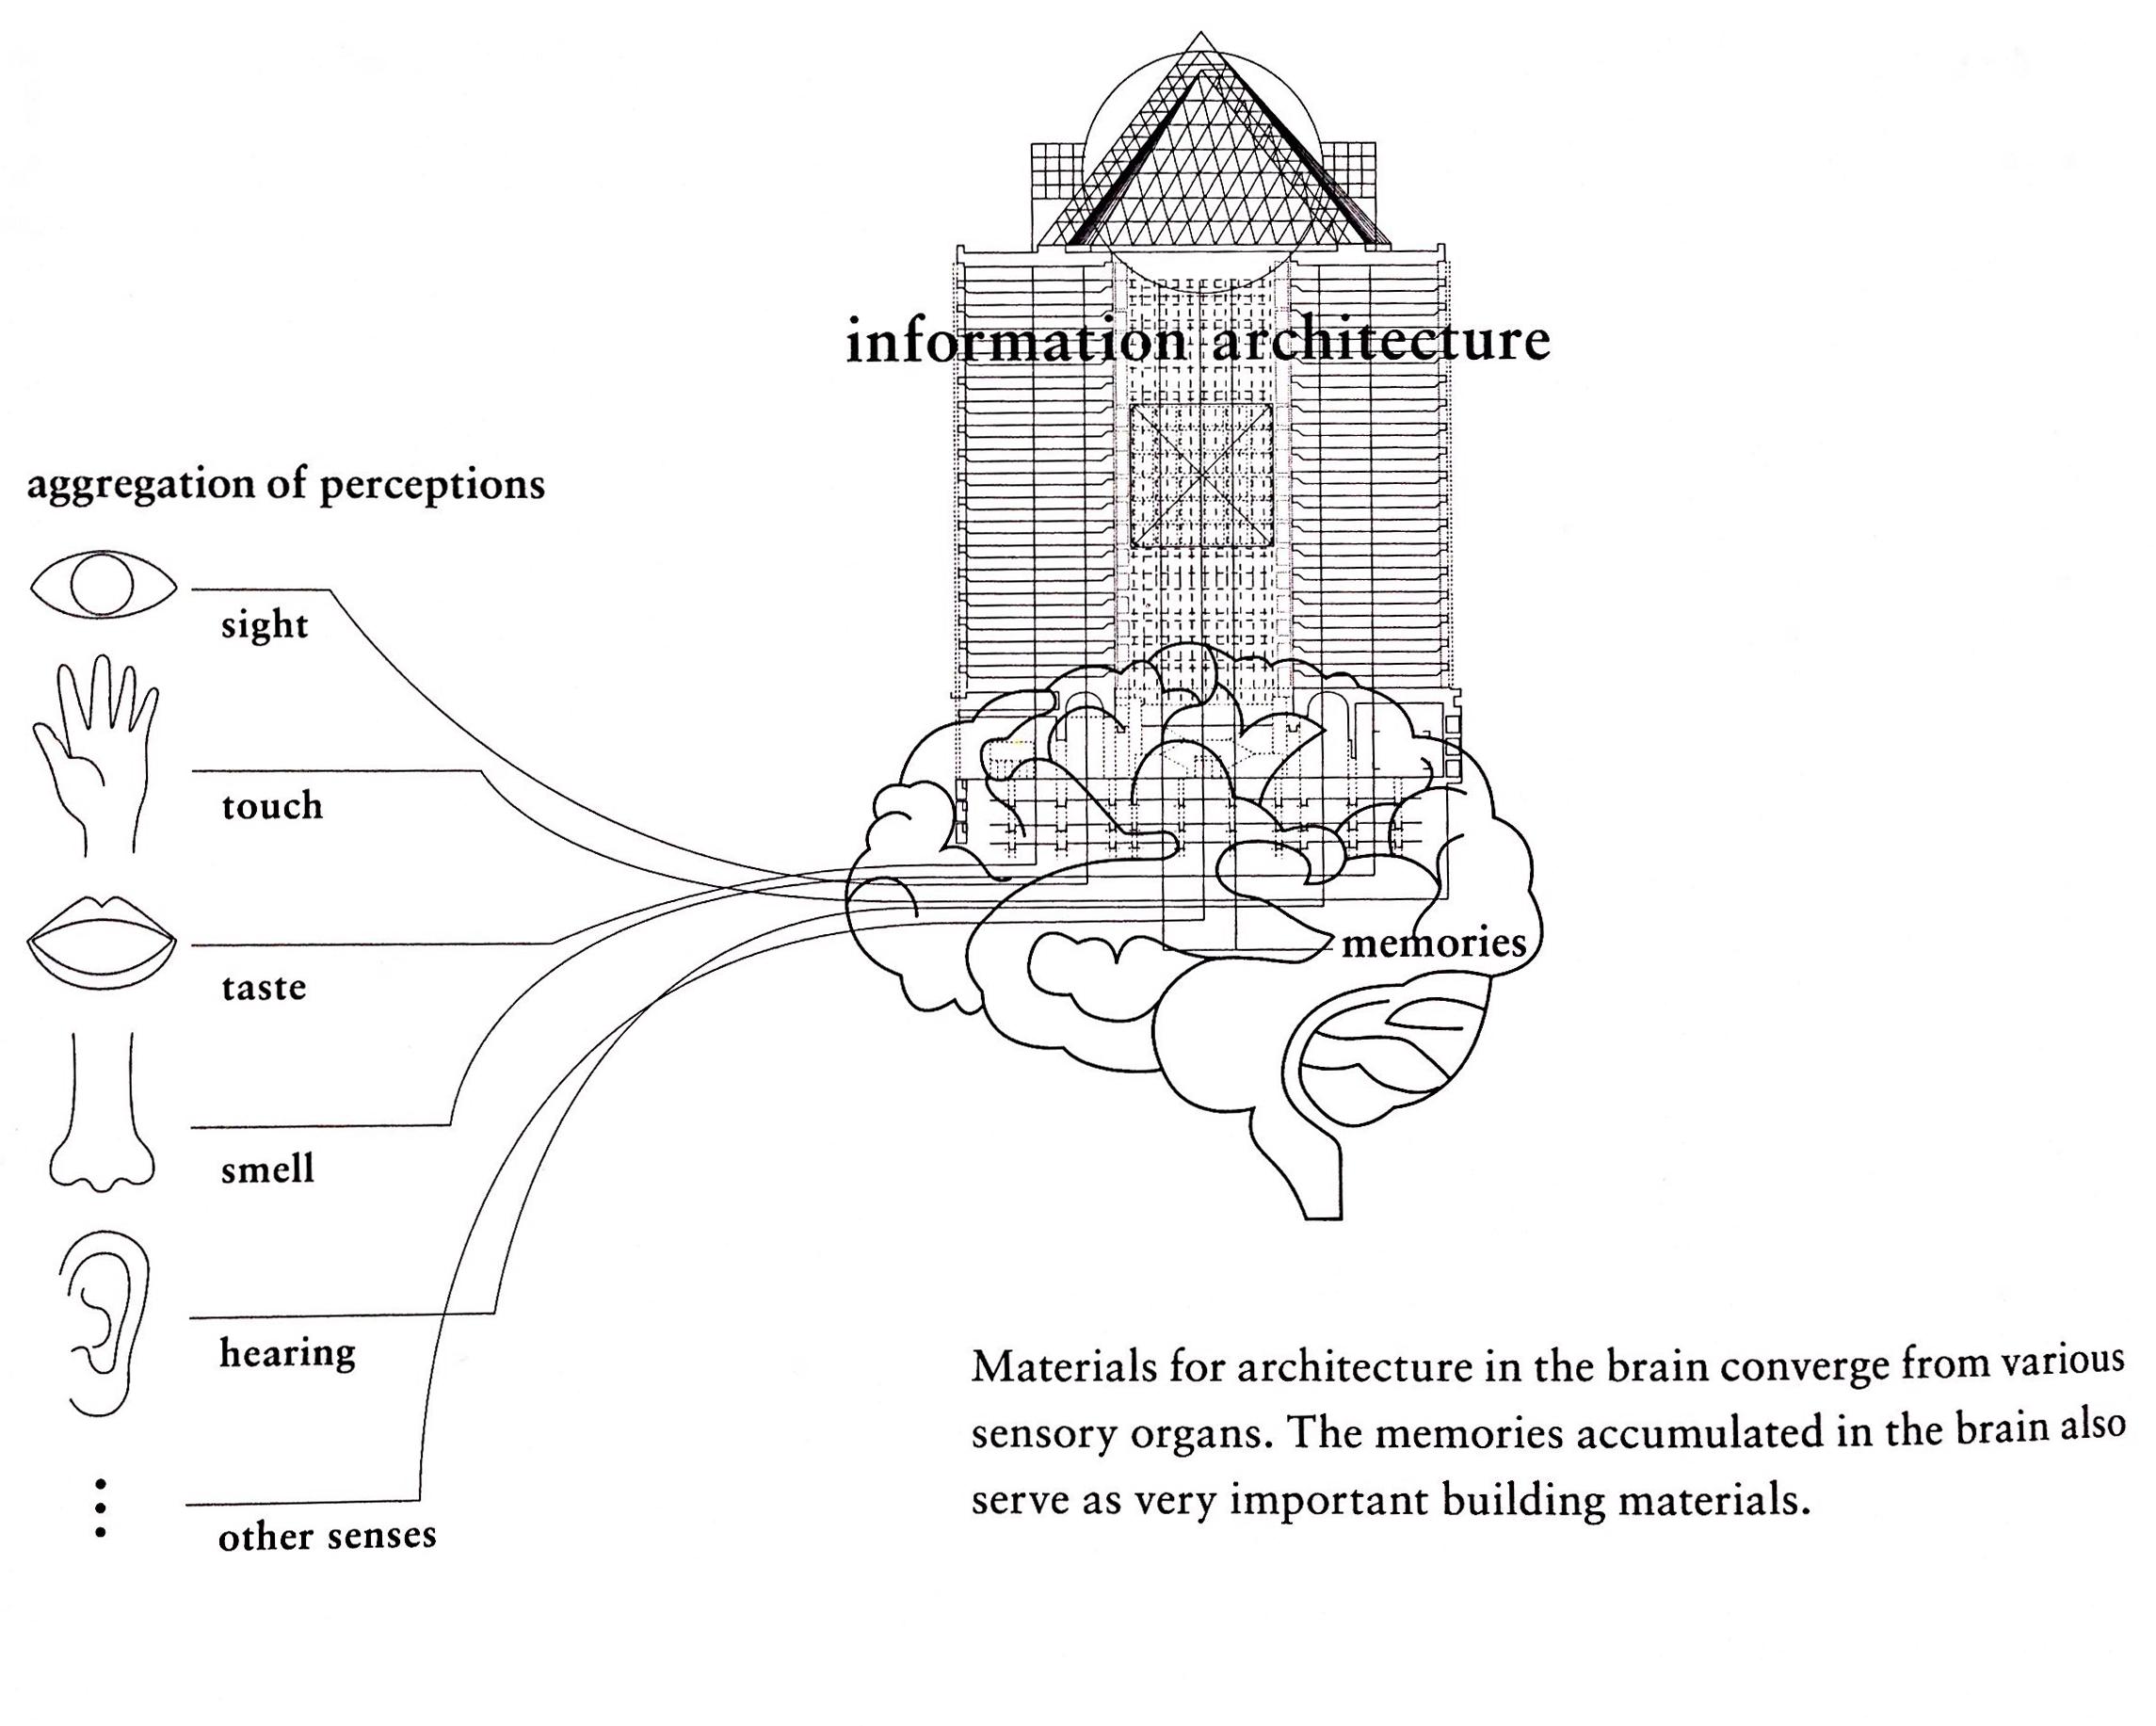 Information architecture.Hara, K.Designing Design. P. 156. (2015)